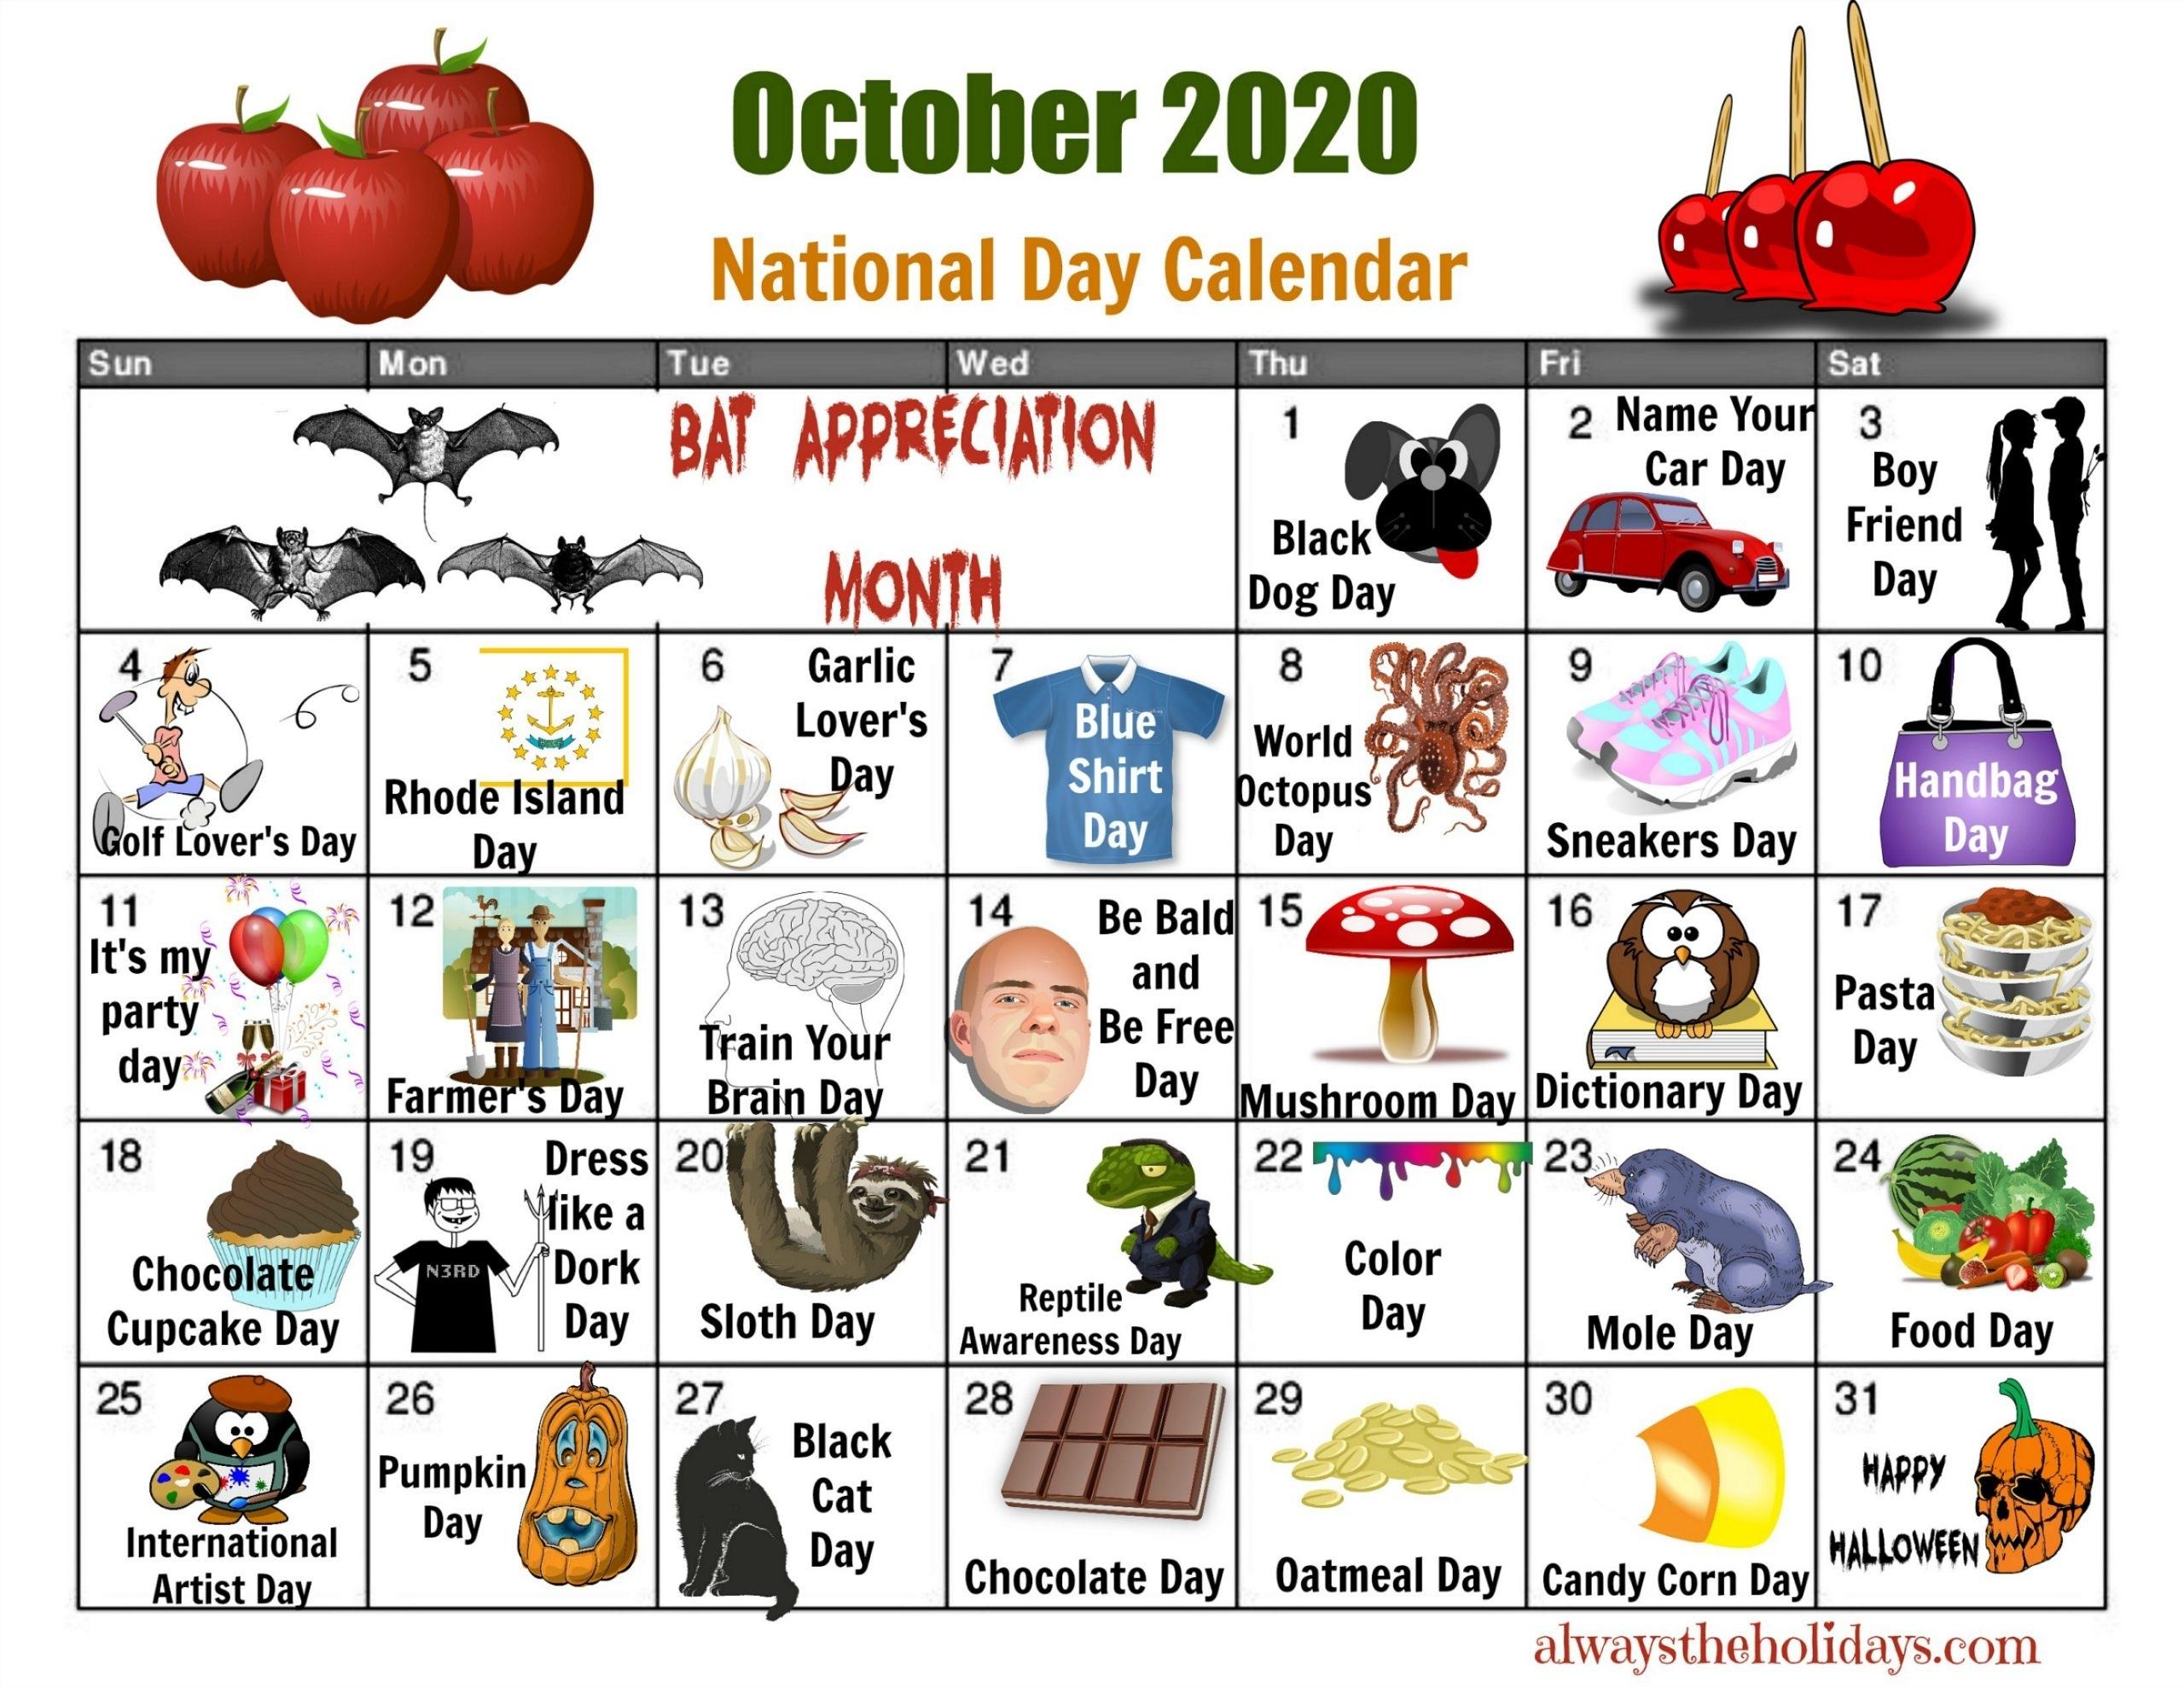 October National Day Calendar - Free Printable Calendars